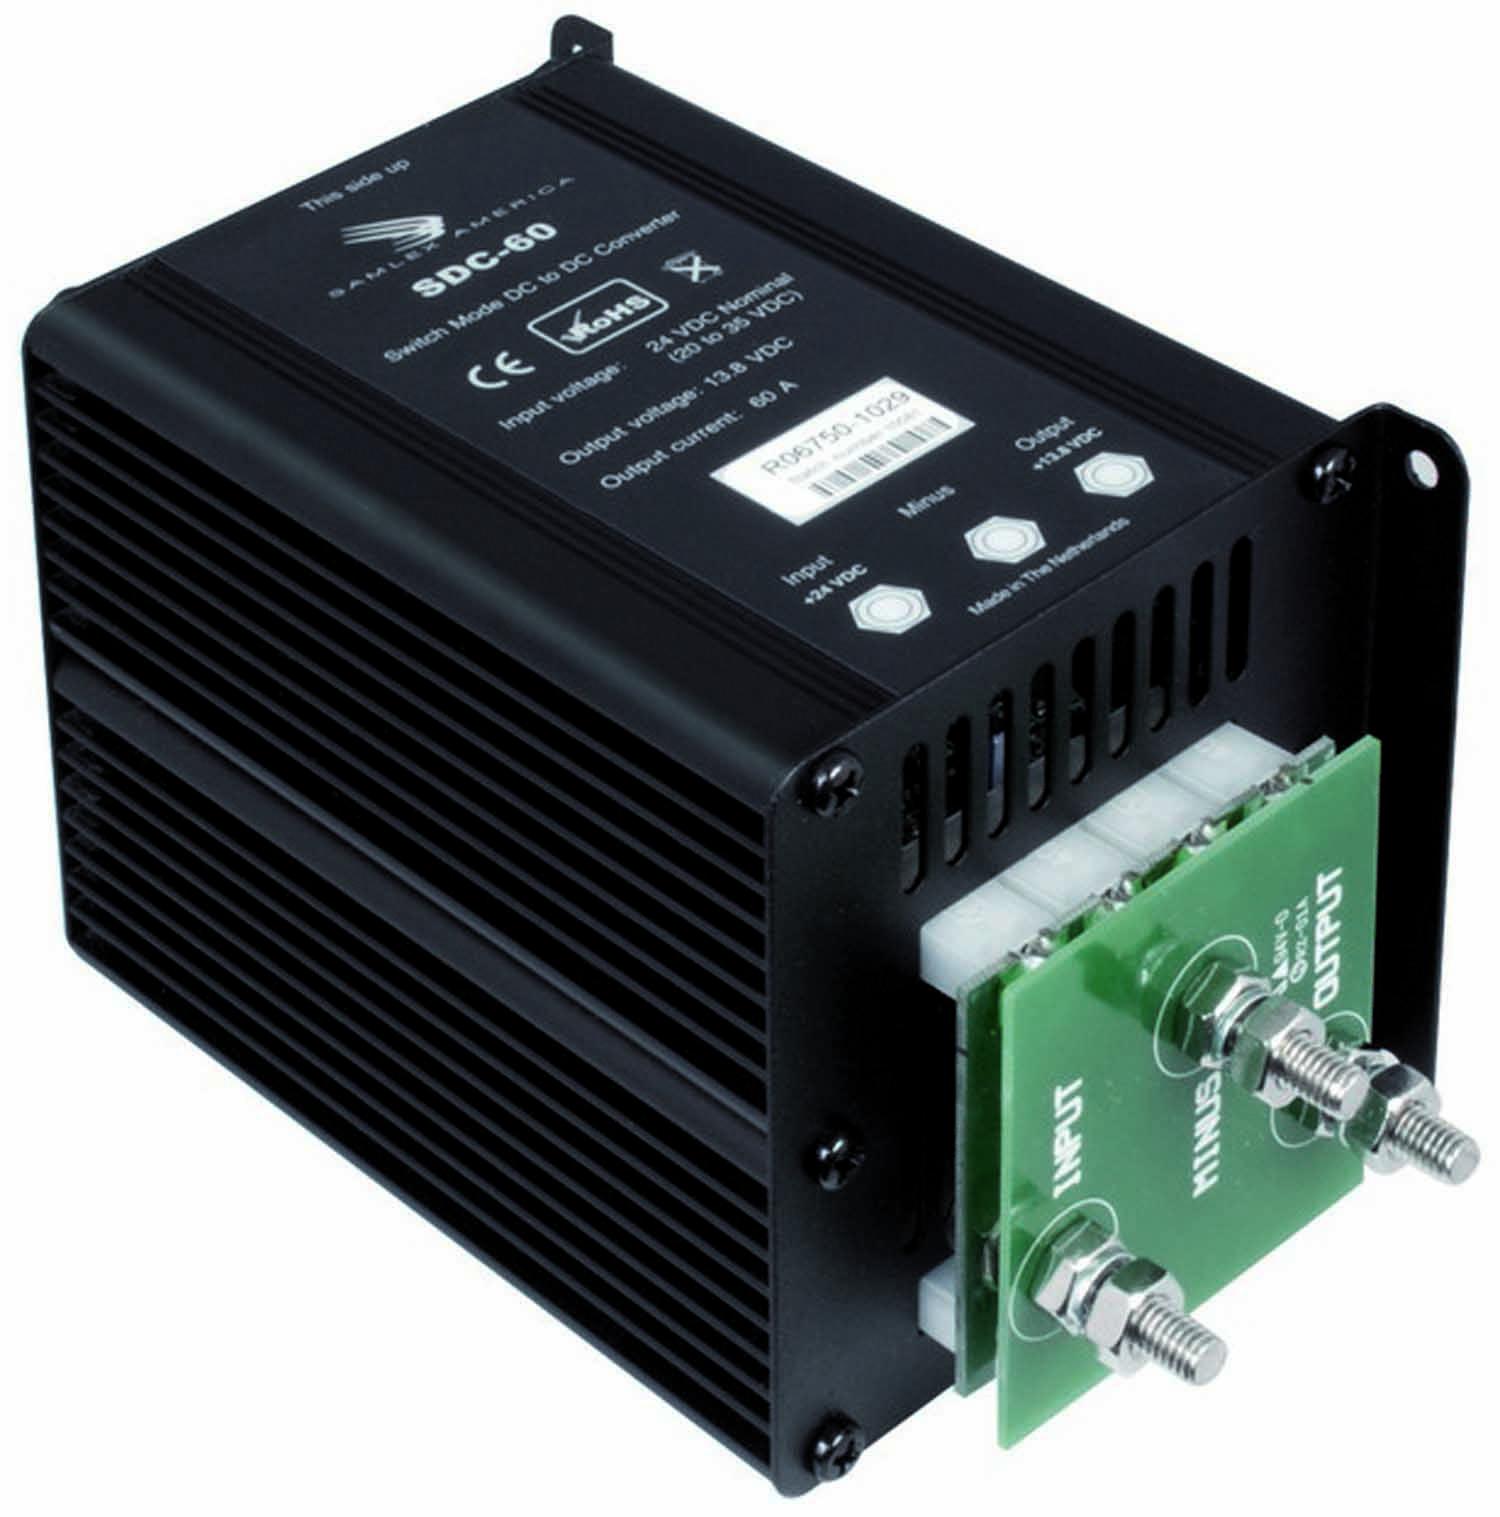 SDC60 - SAMLEX - SDC60 HIGH EFFICIENCY SWITCH MODE STEP DOWN DC-DC CONVERTER  - CONVERTS 24 VDC TO 12 VDC